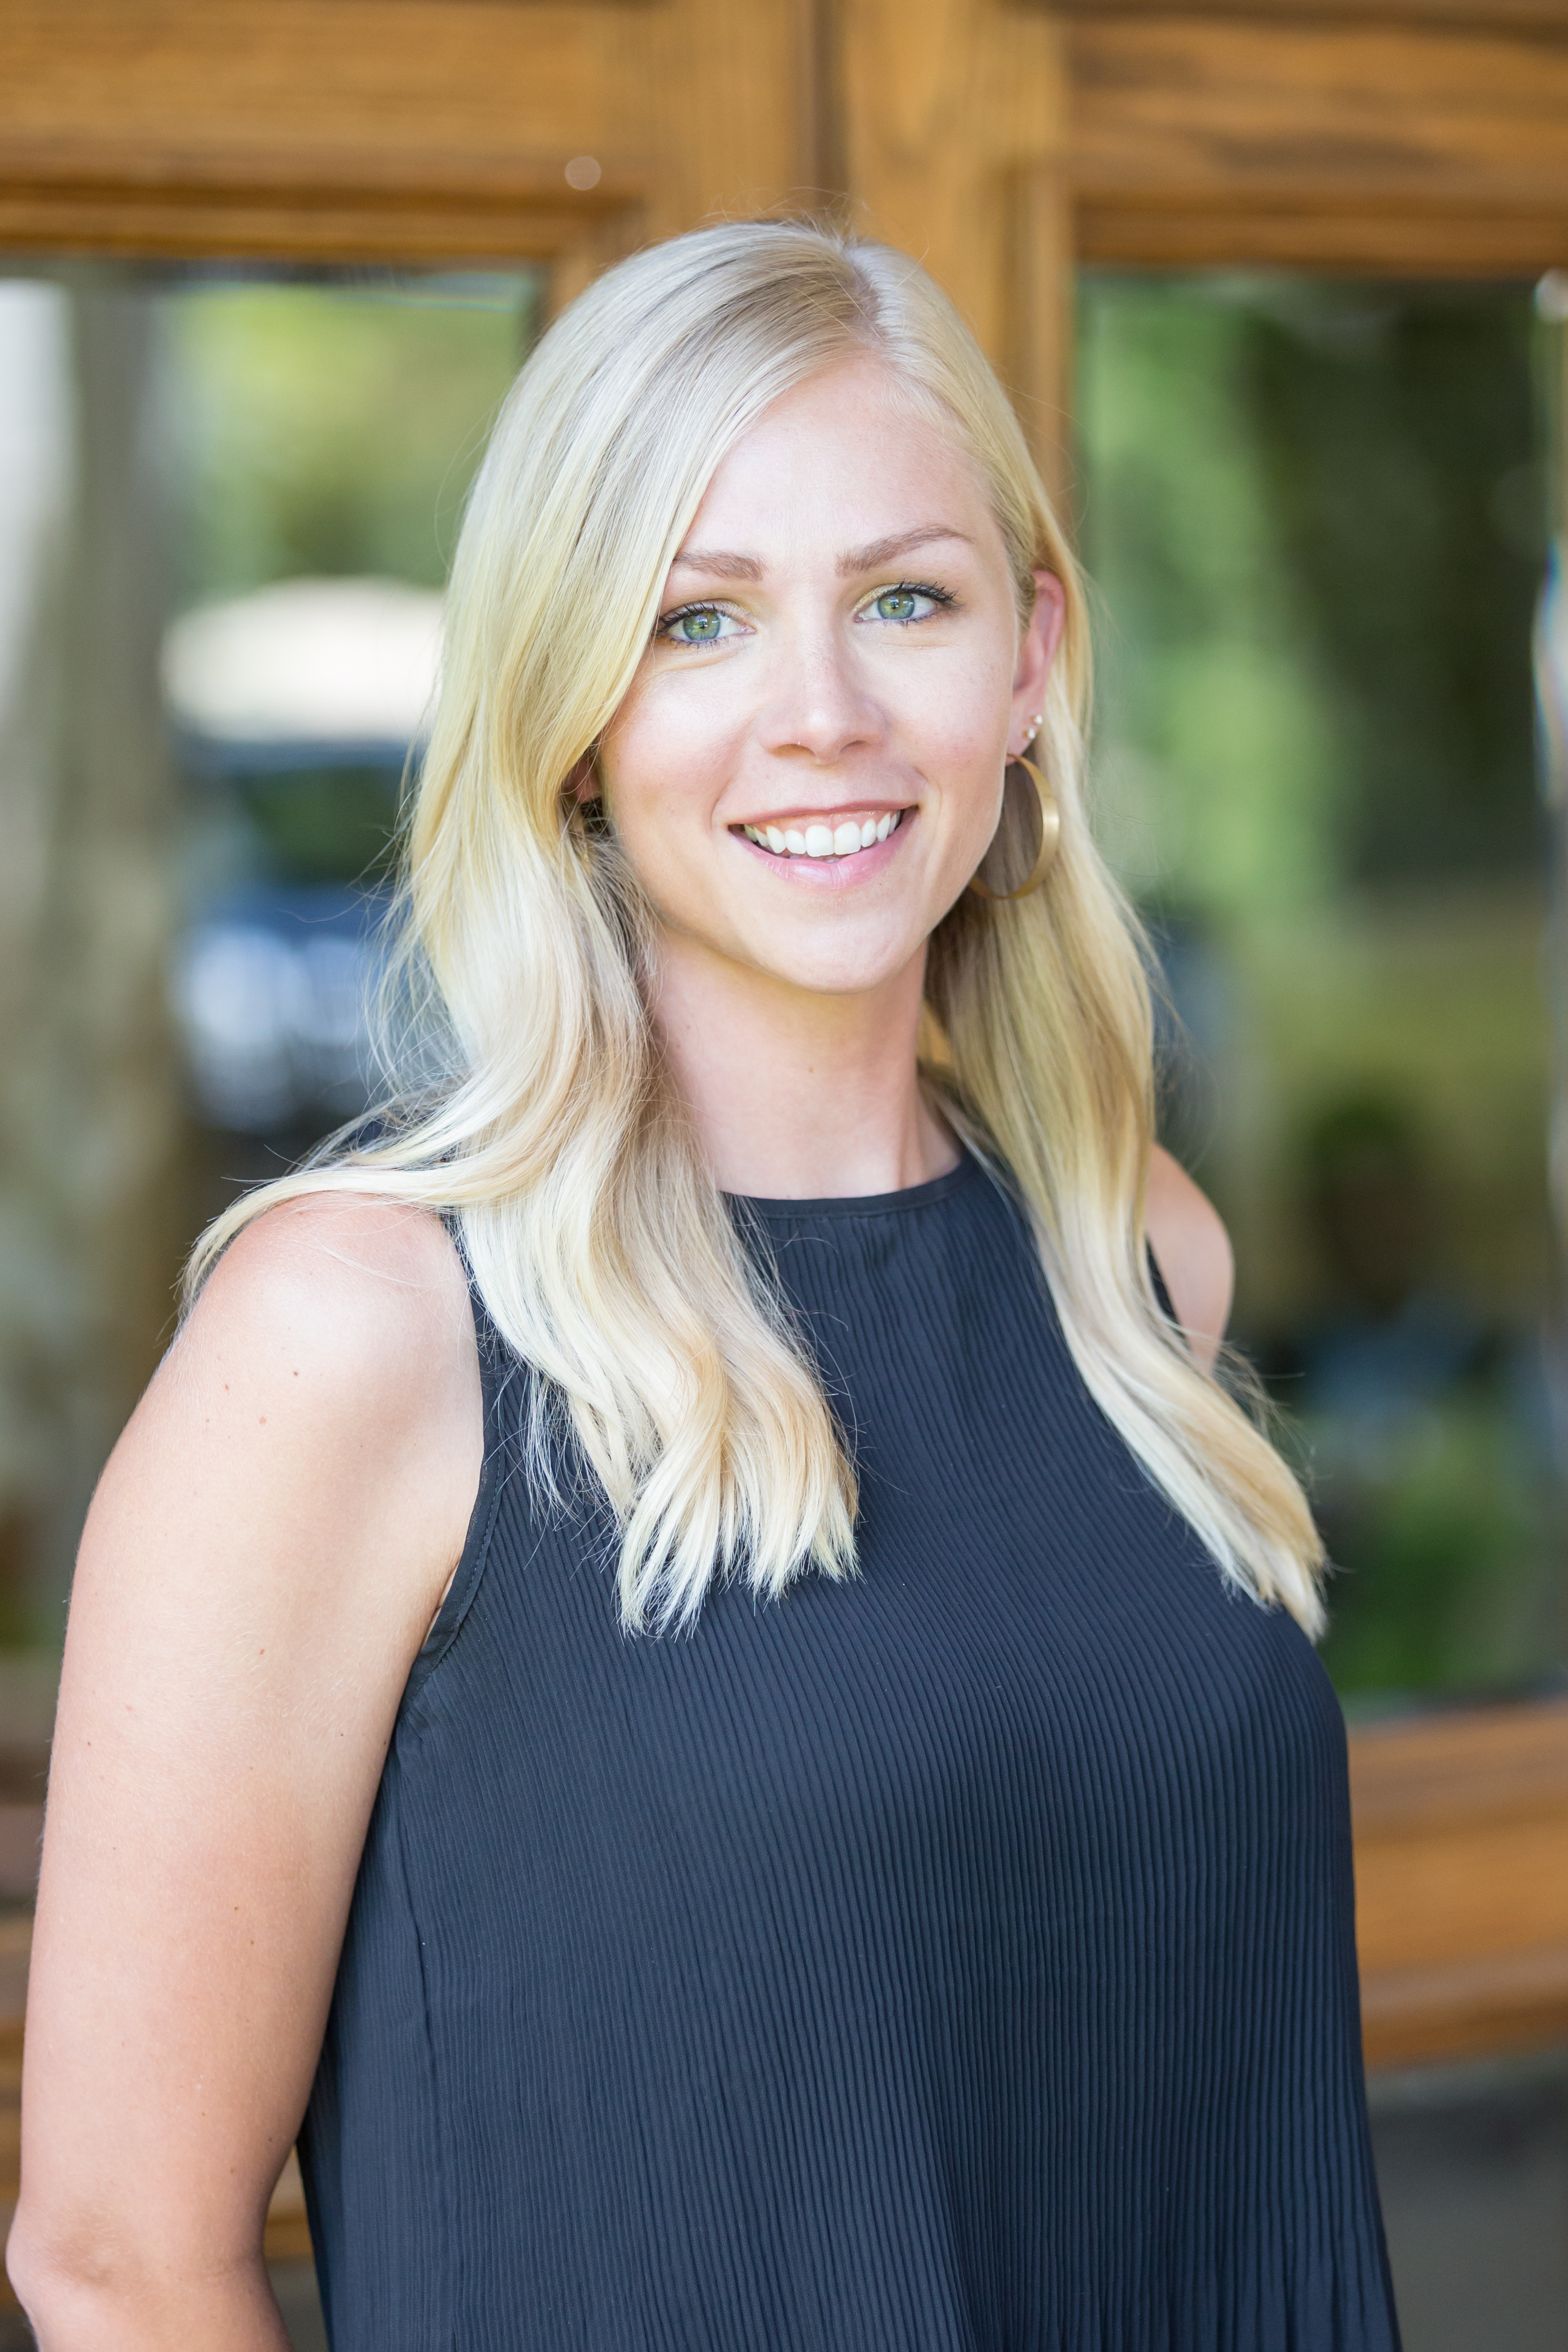 Jenna Harper